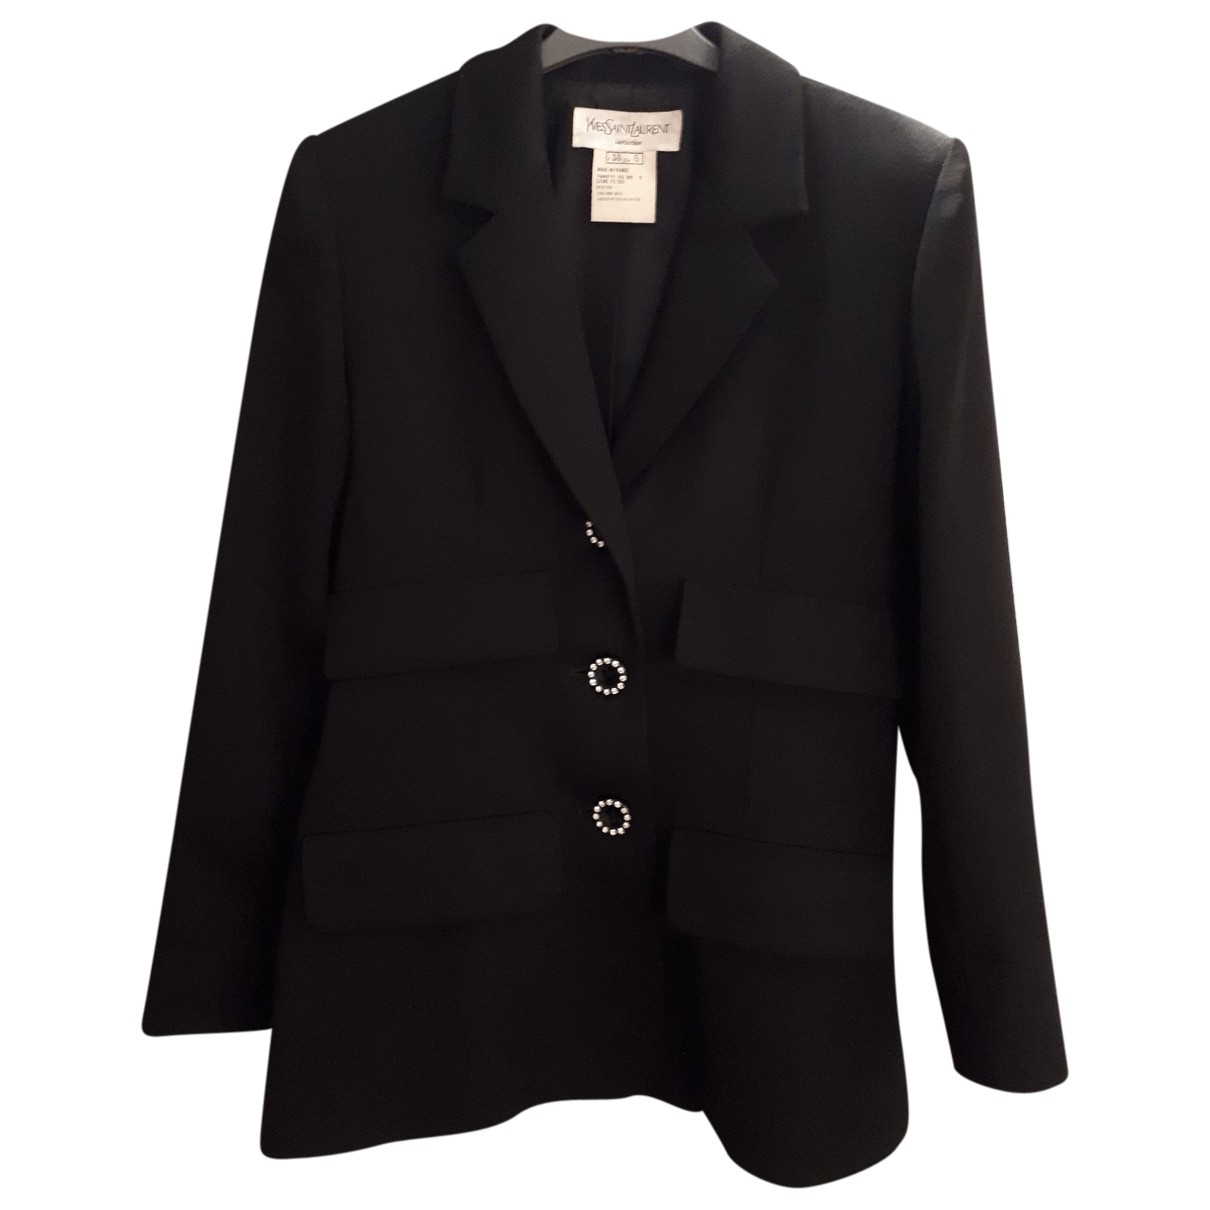 Yves Saint Laurent \N Black Wool jacket for Women 38 FR